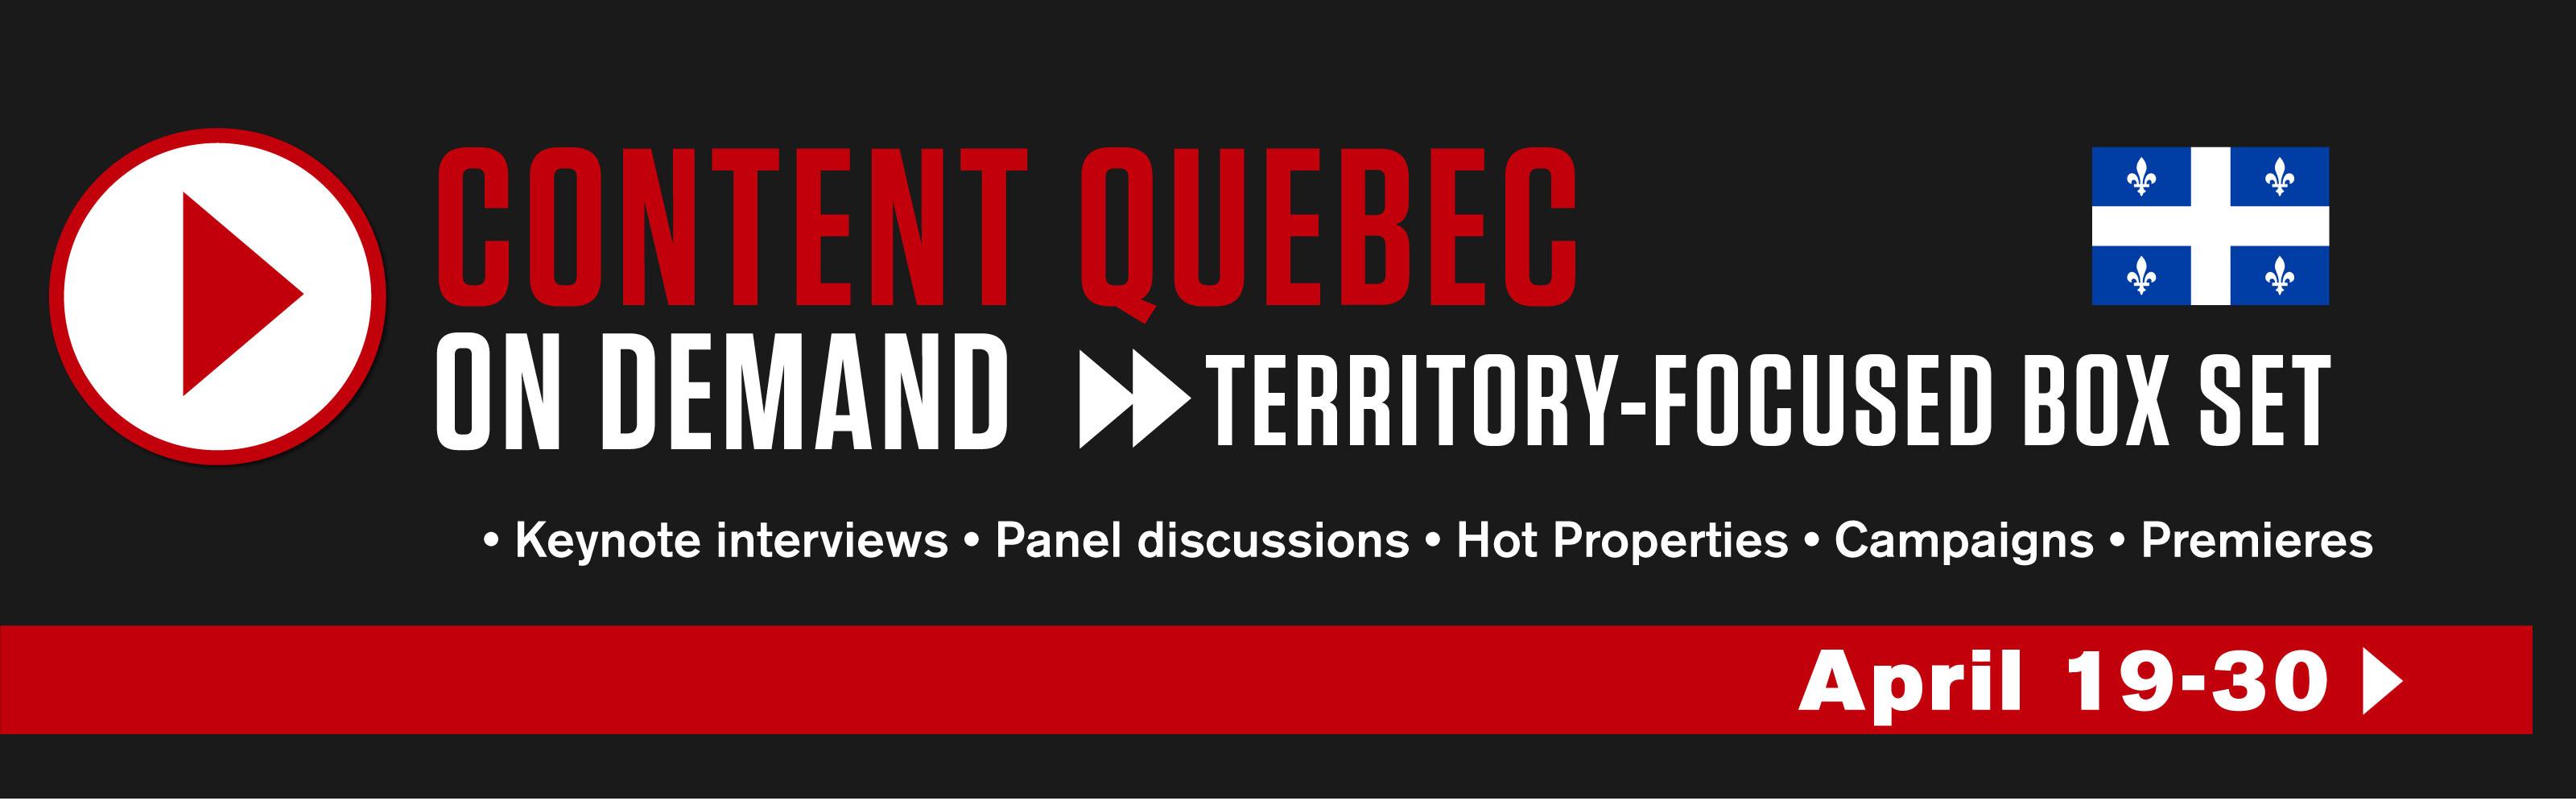 Content Quebec On Demand